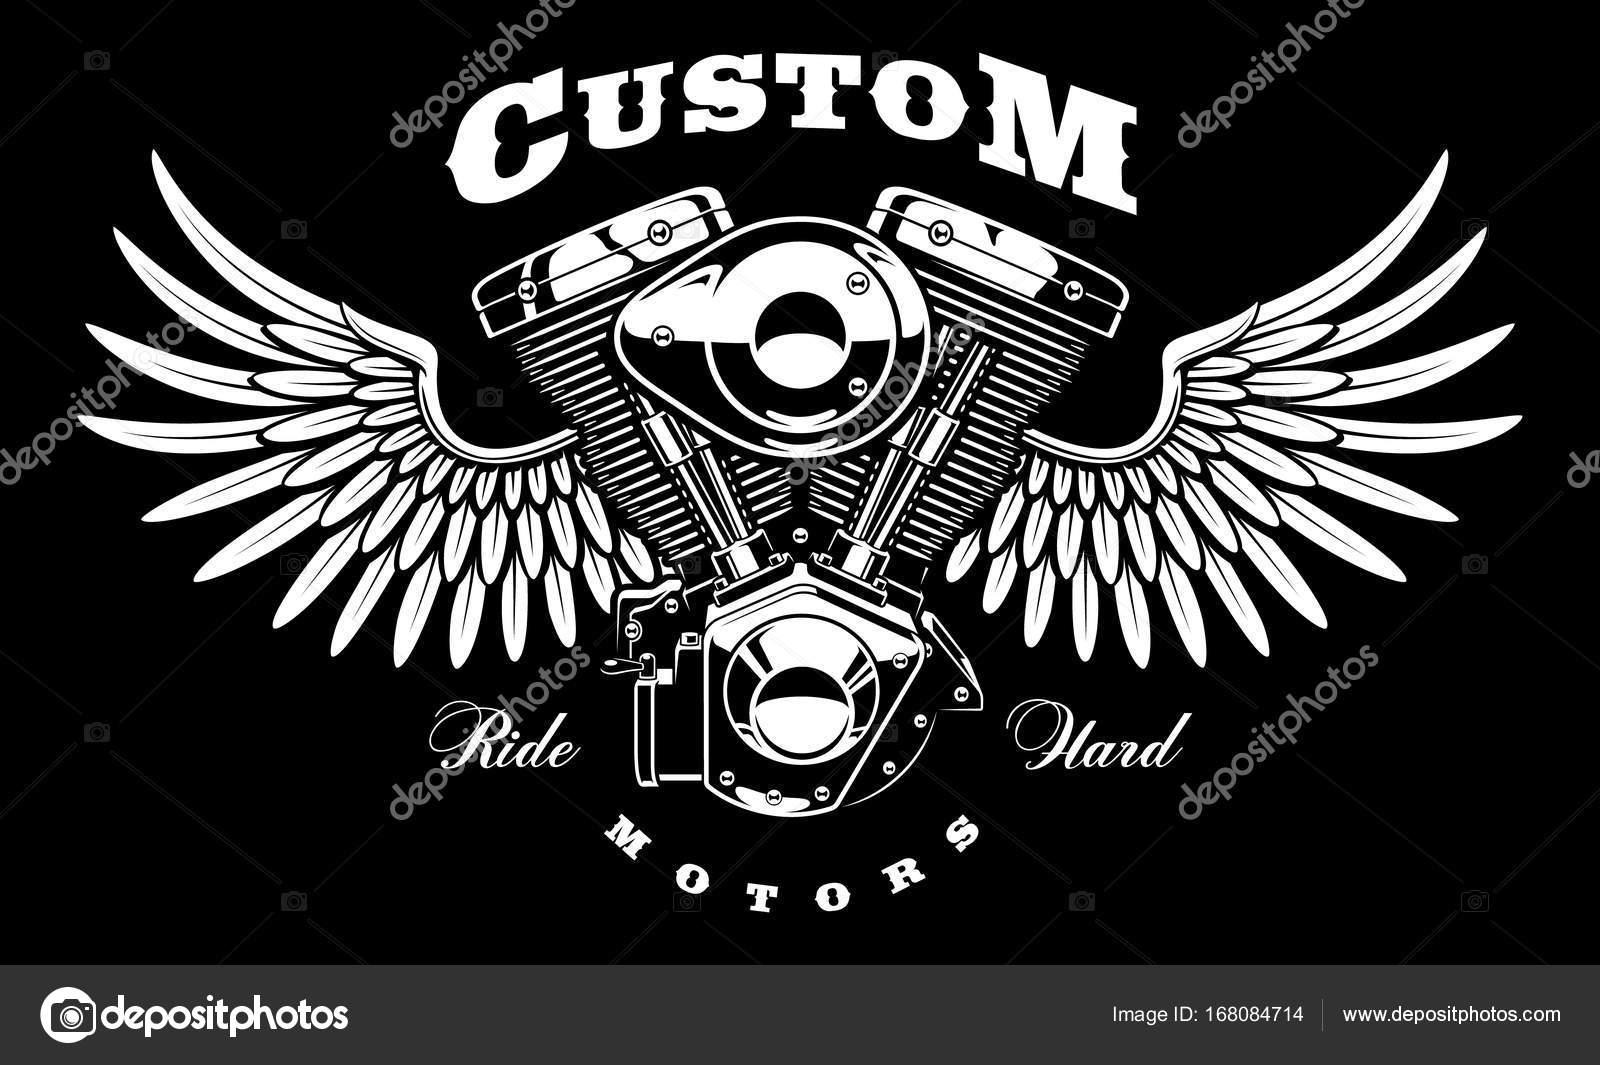 Bikers Club Logo Template - Download Free Vector Art, Stock ...